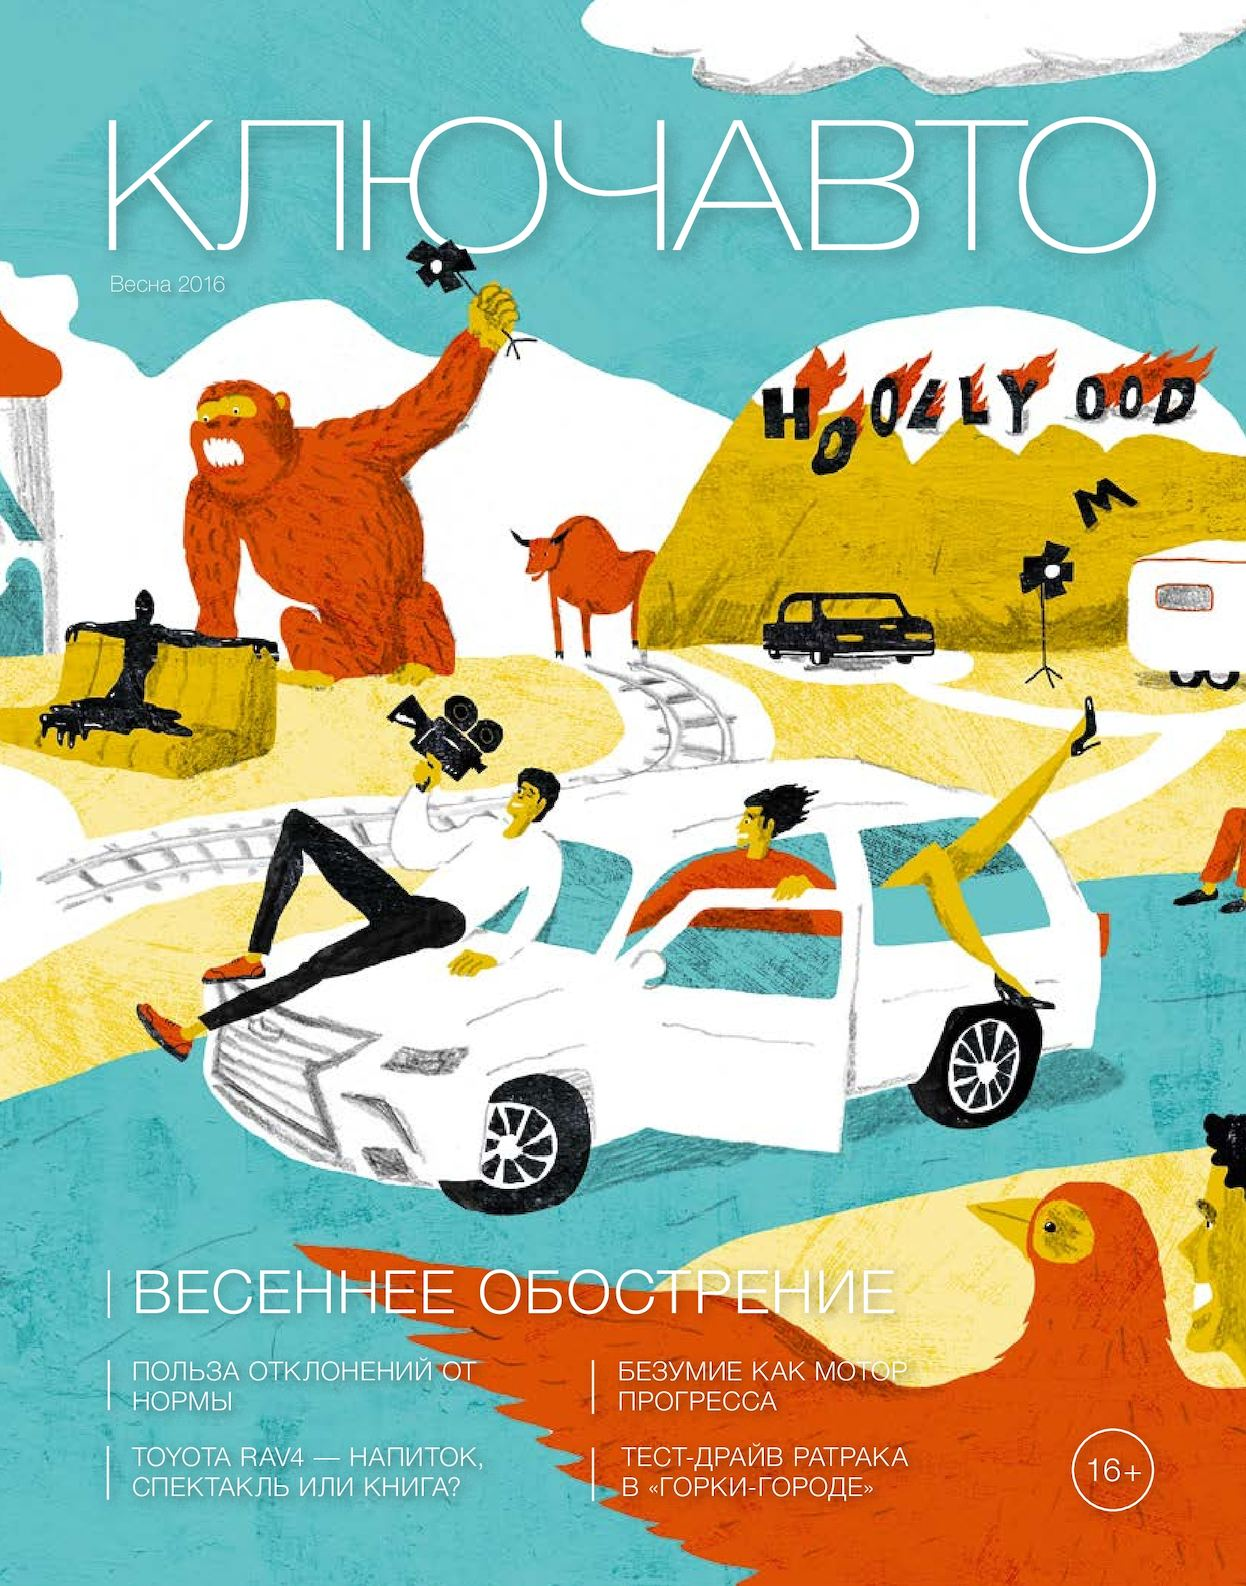 Calaméo - КЛЮЧАВТО №30 (Весна 2016) b1cb7a5345e